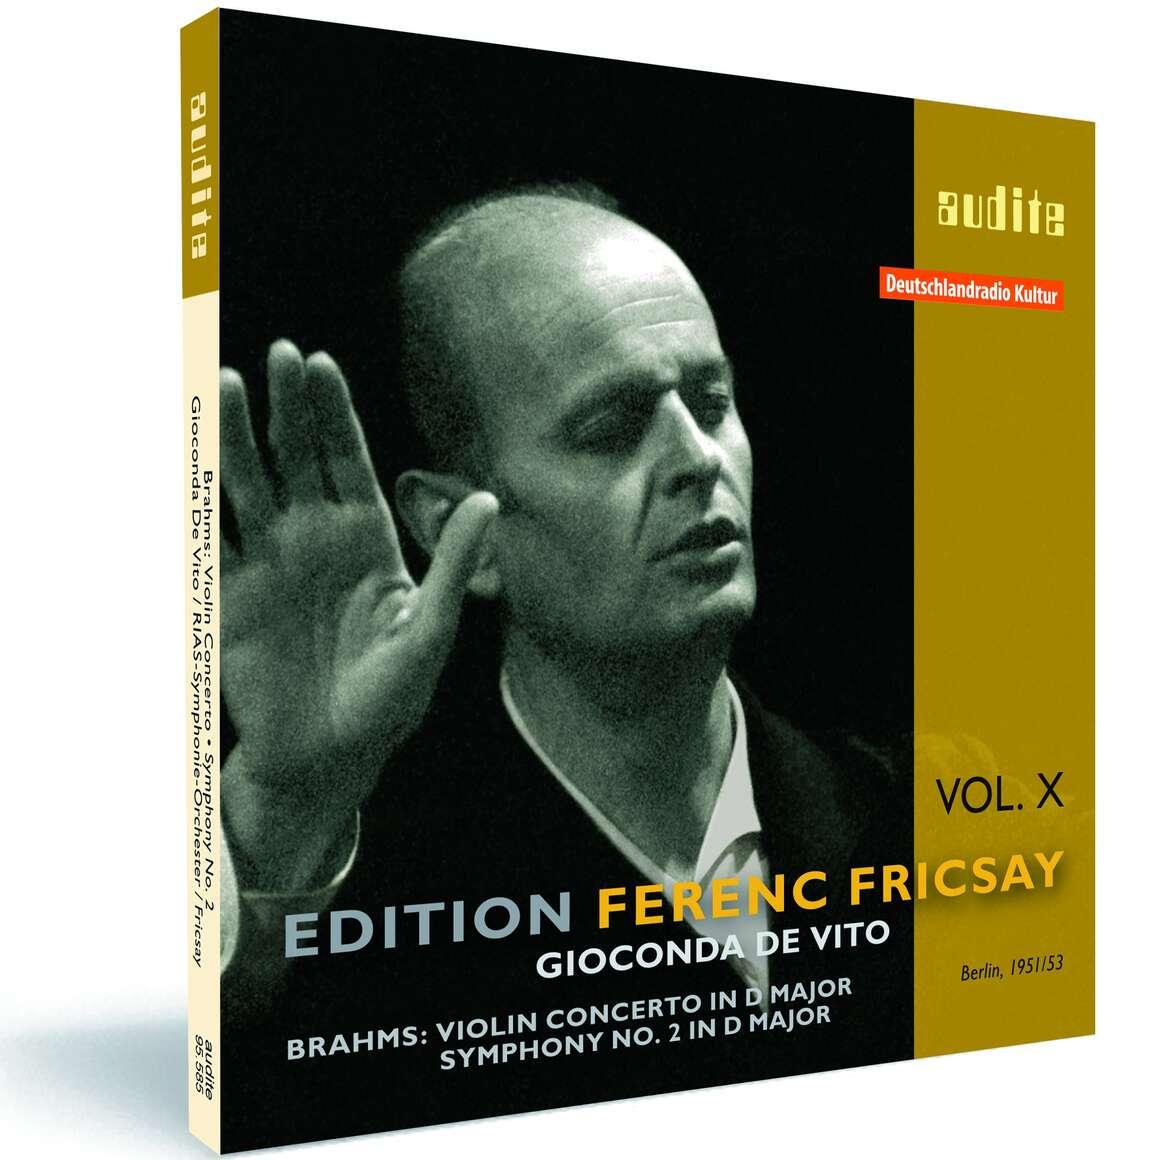 Edition Ferenc Fricsay (X) – J. Brahms: Violin Concerto & Symphony No. 2